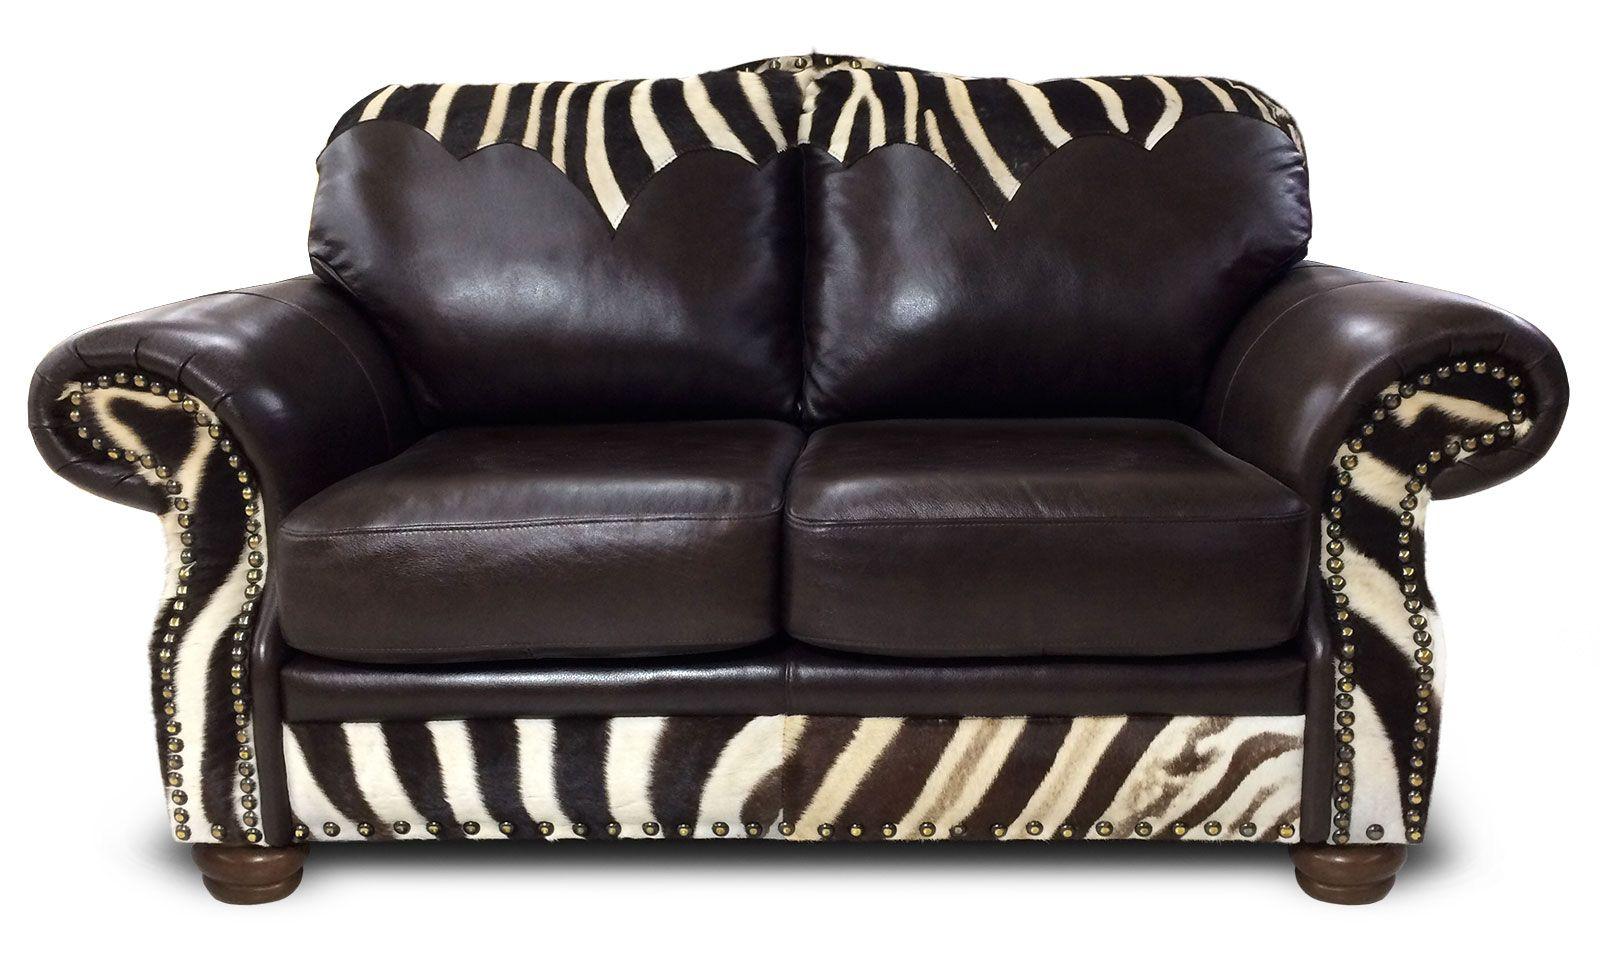 Safari Furniture Collection Furniture The Leather Sofa